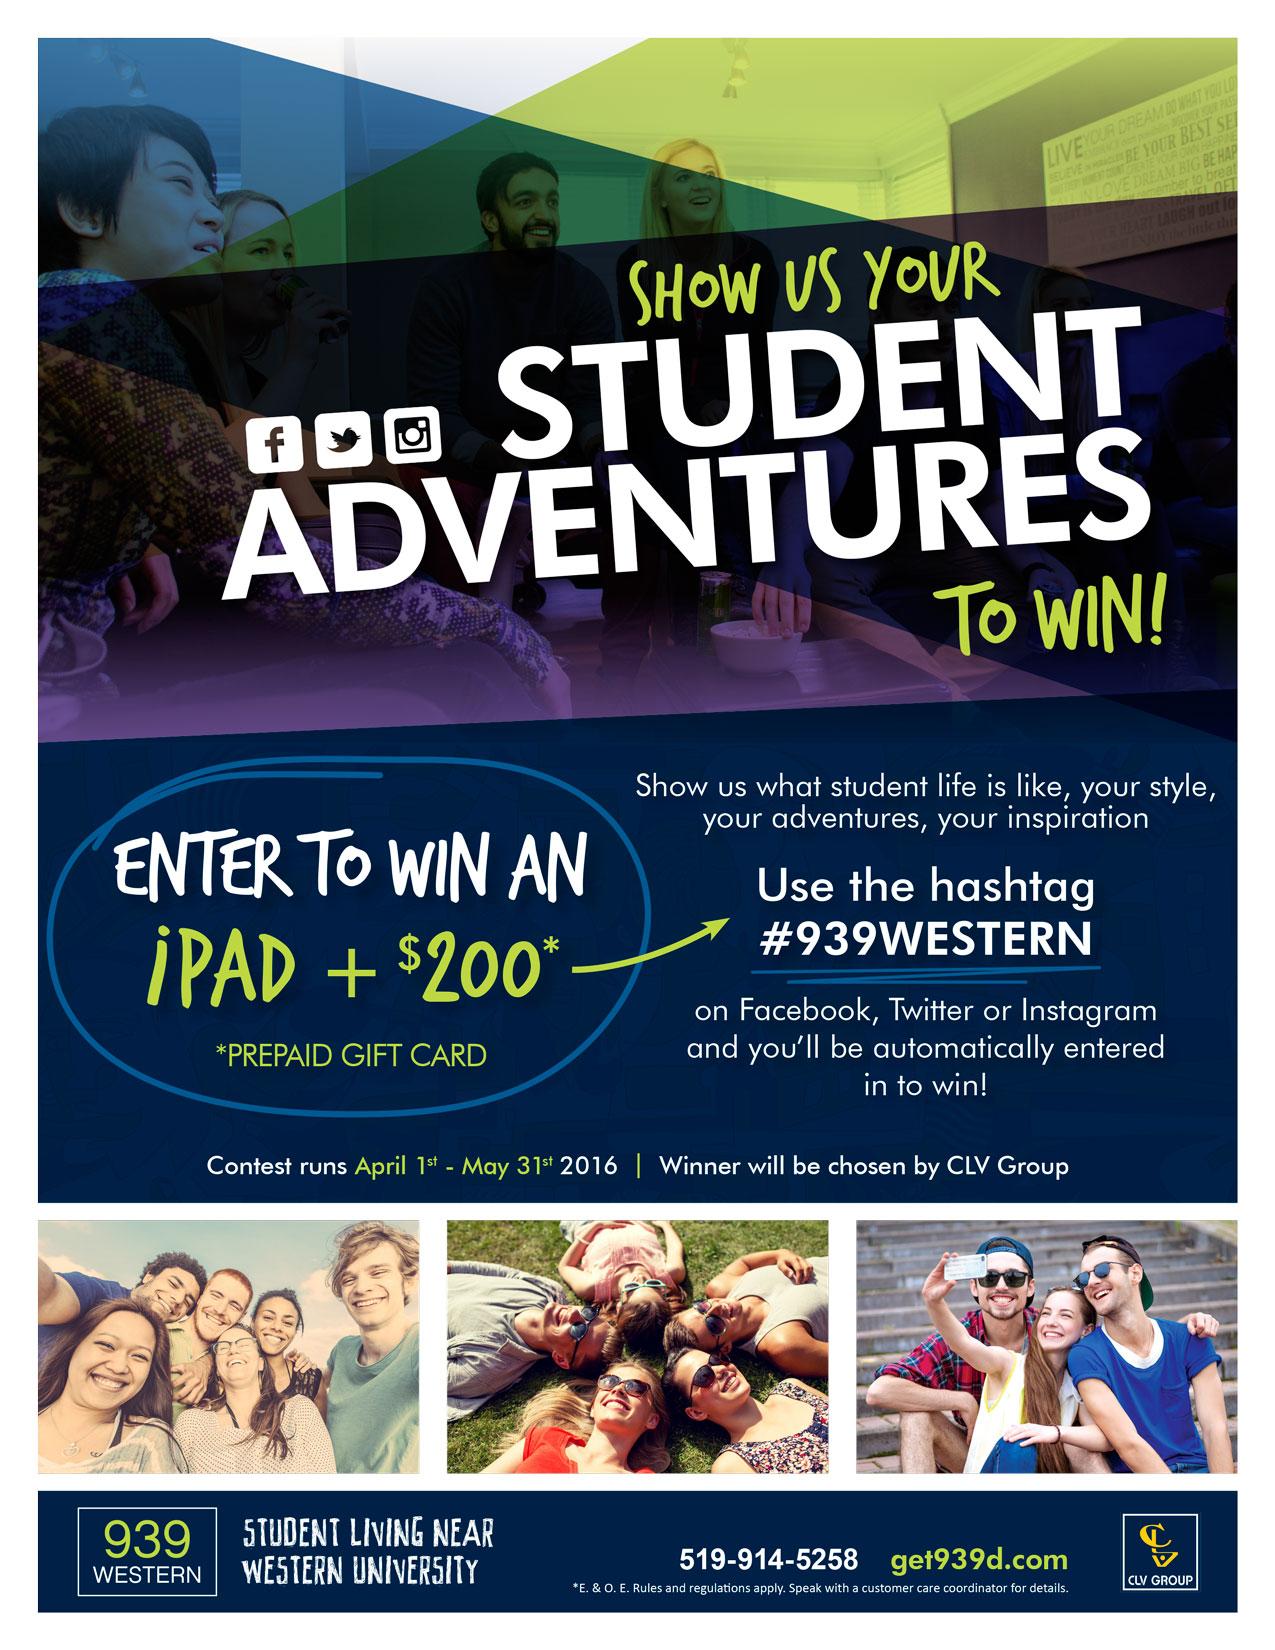 939WesternBlog-Contest-Student-Poster-April4